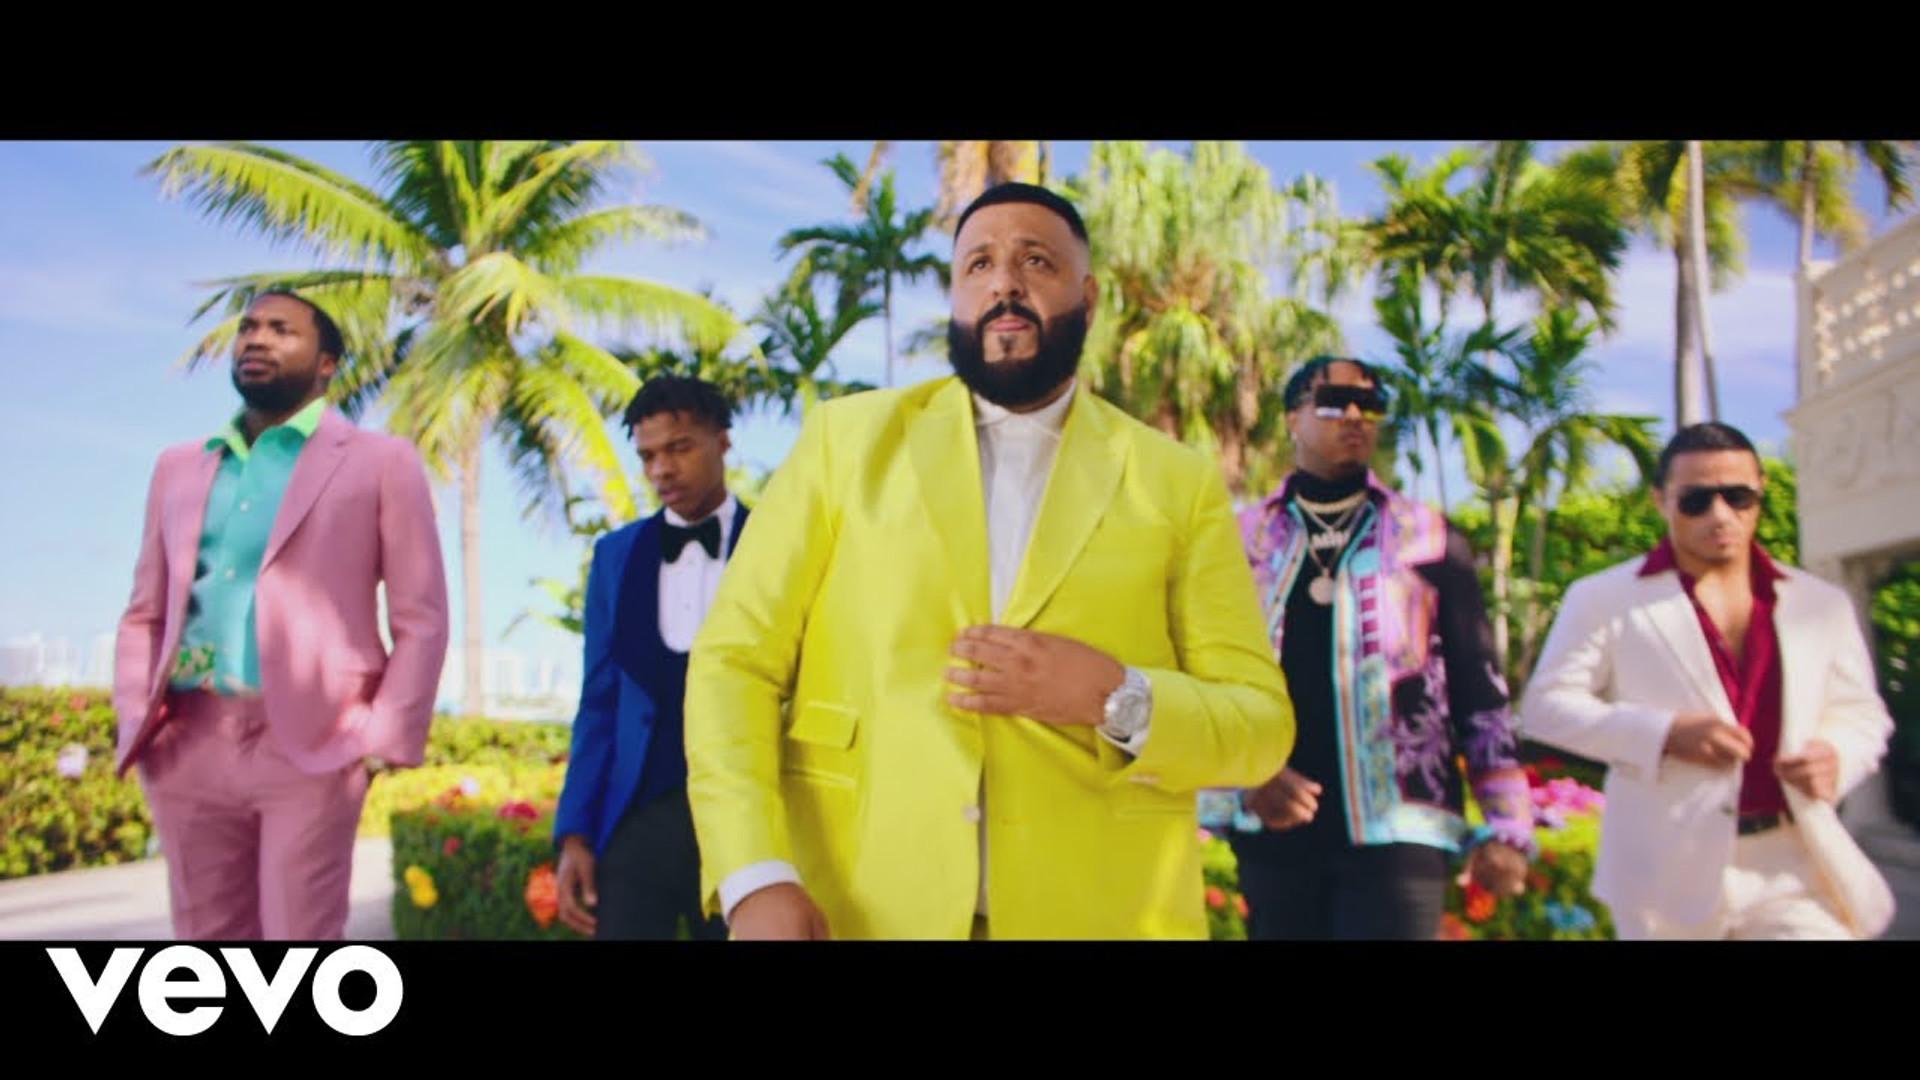 You Stay - DJ Khaled